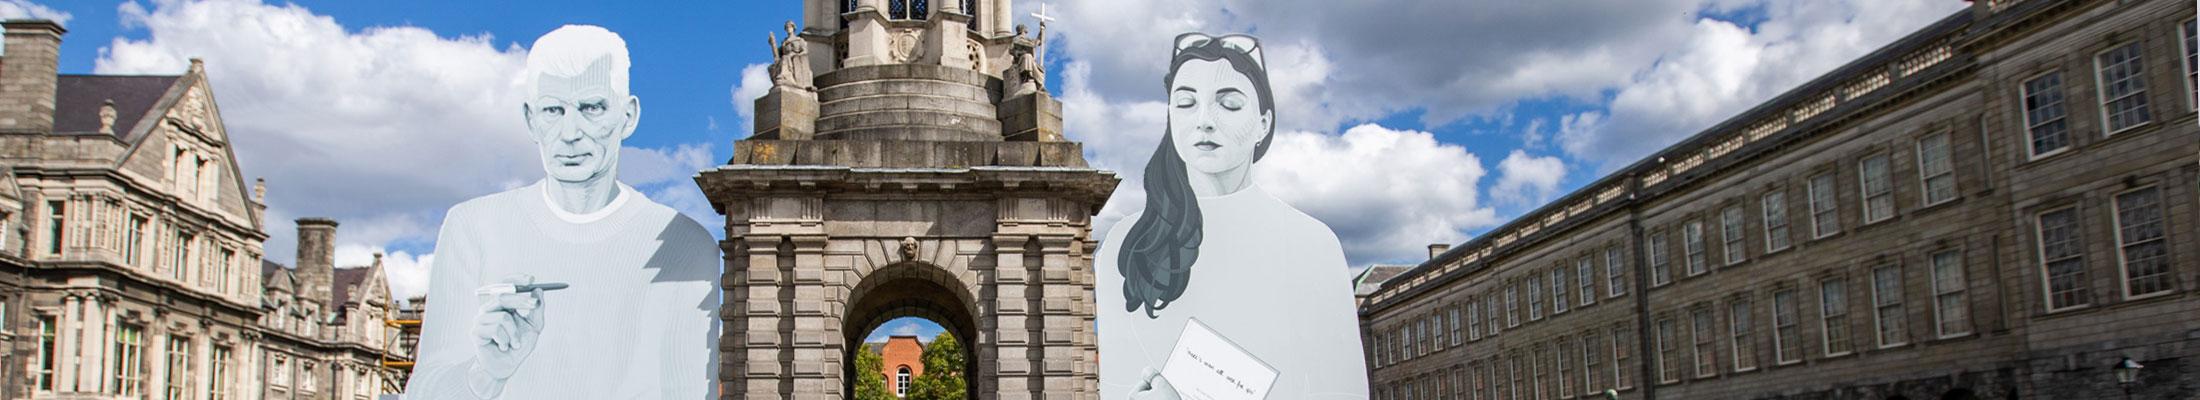 Trinity College Dublin, the University of Dublin, Ireland